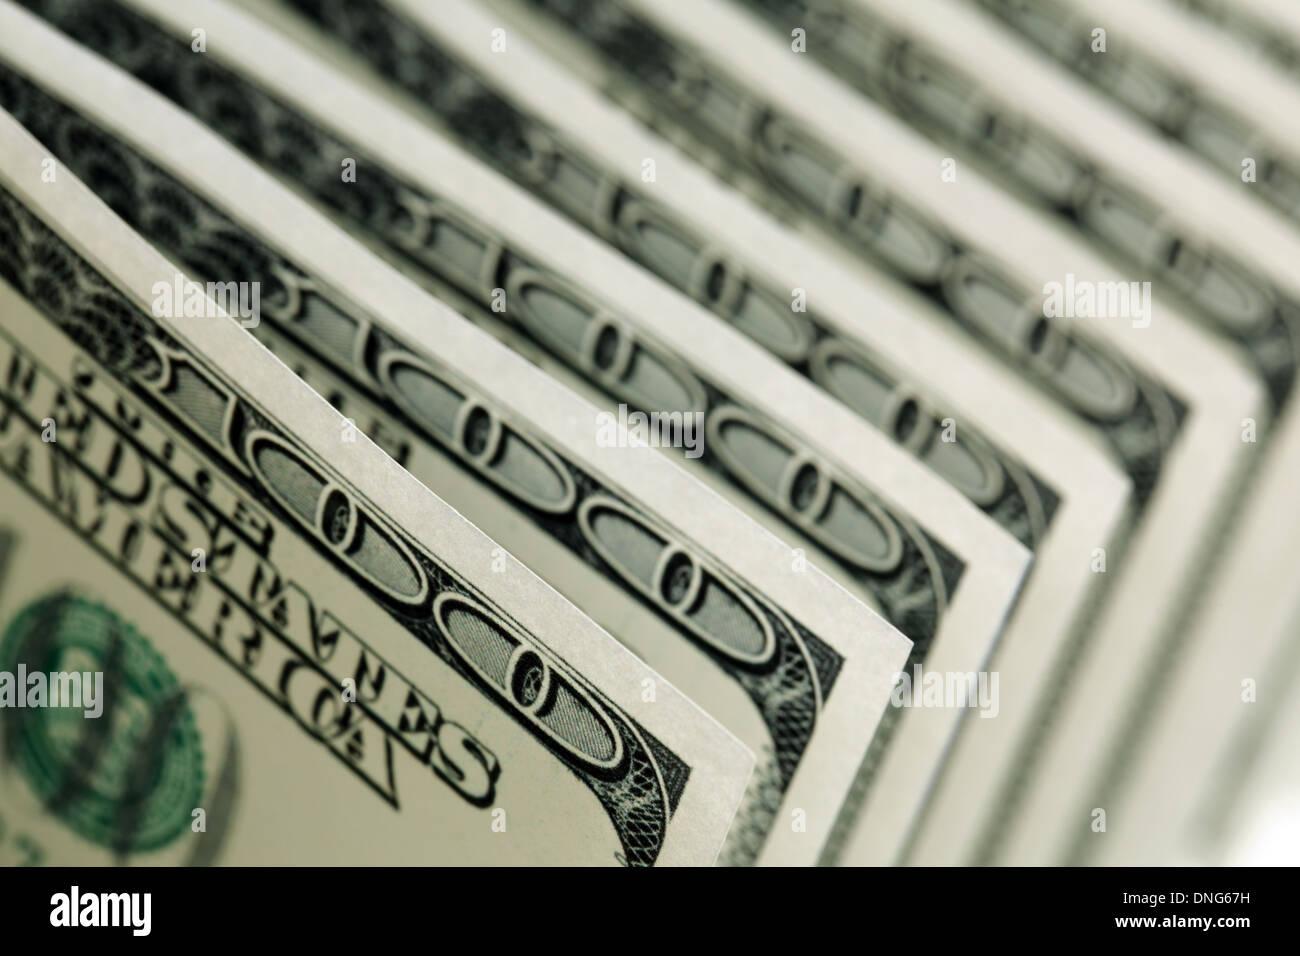 Hundert-Dollar-Scheine Stockbild